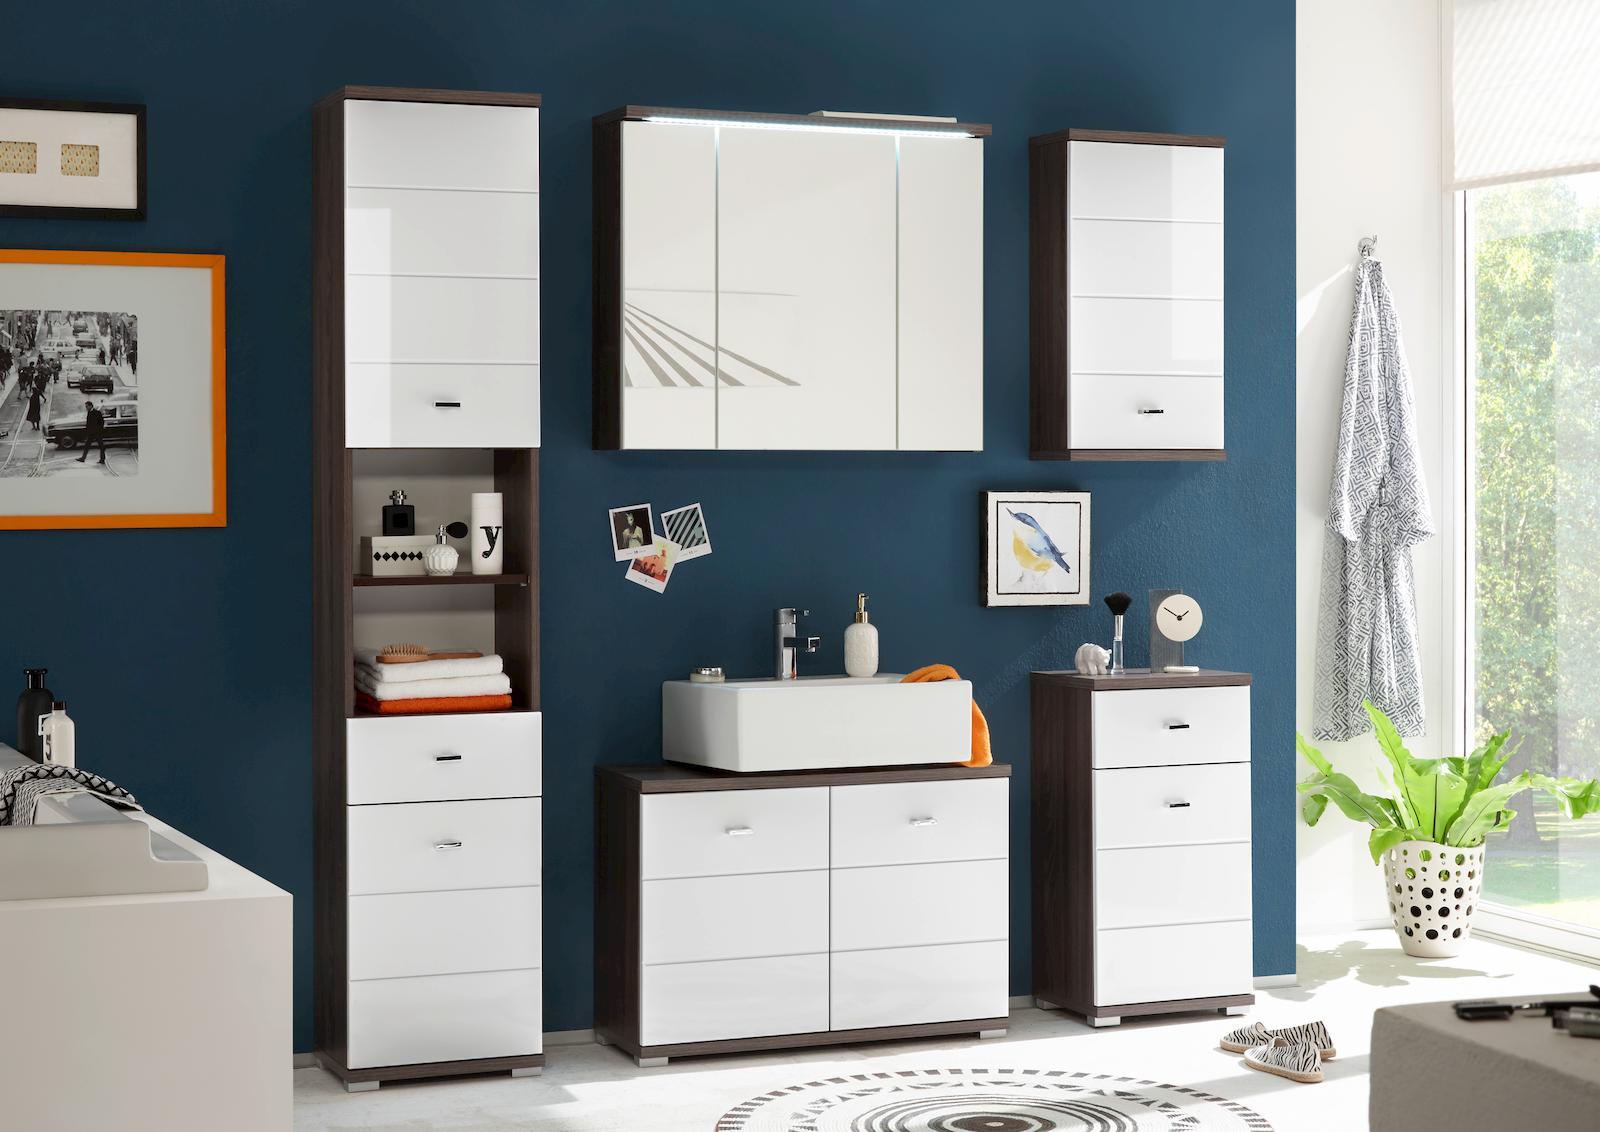 pool unterschrank ulme wei bad bad unterschr nke. Black Bedroom Furniture Sets. Home Design Ideas